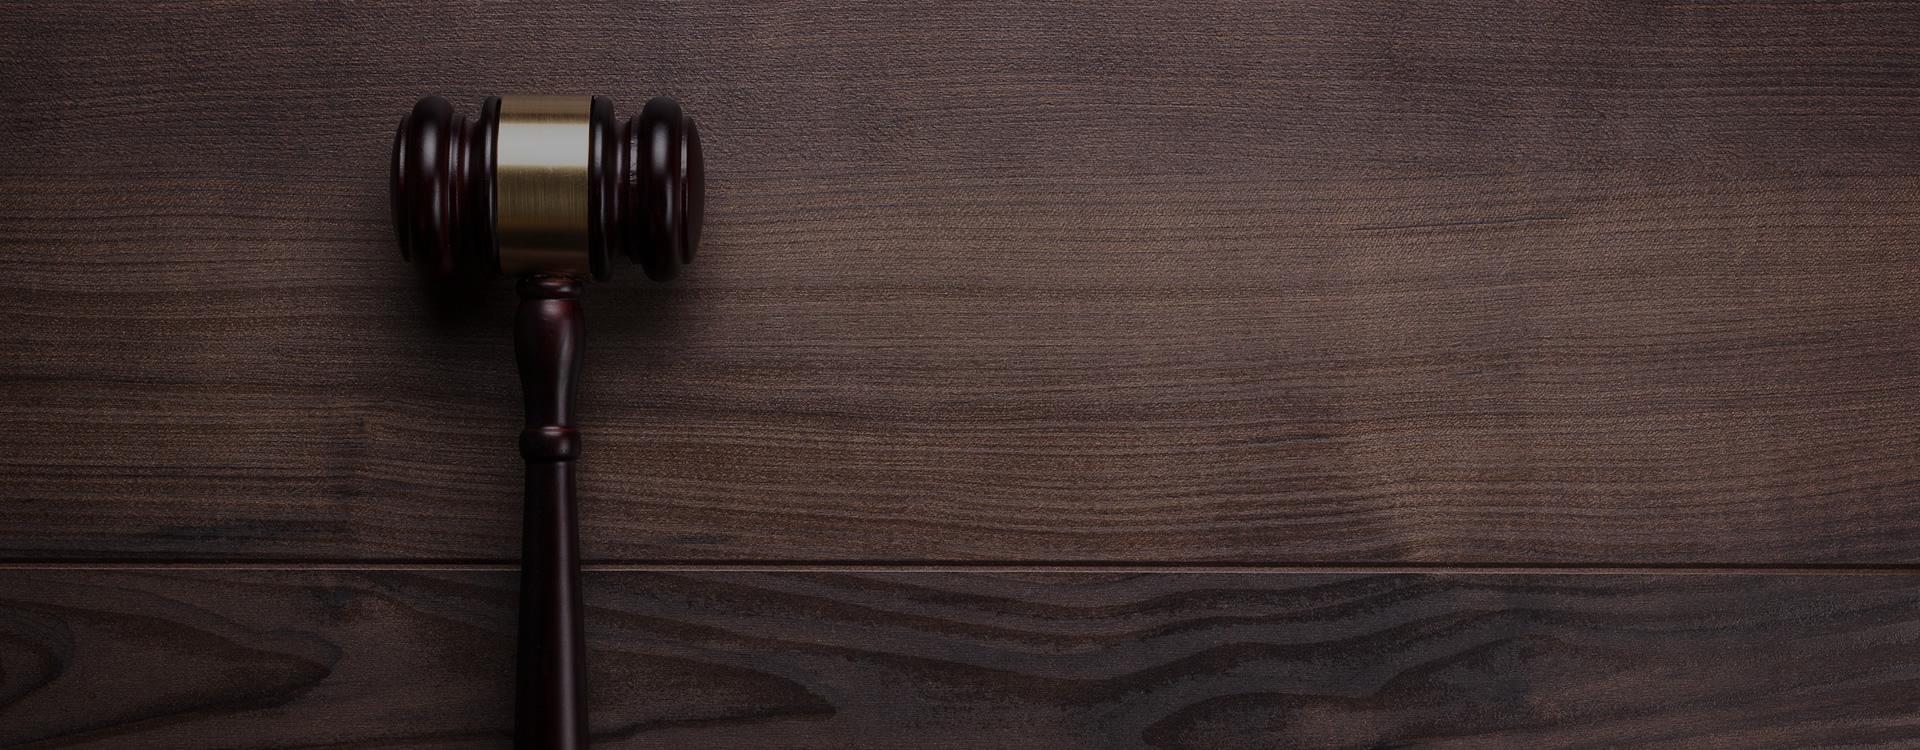 slide-law-firm-2